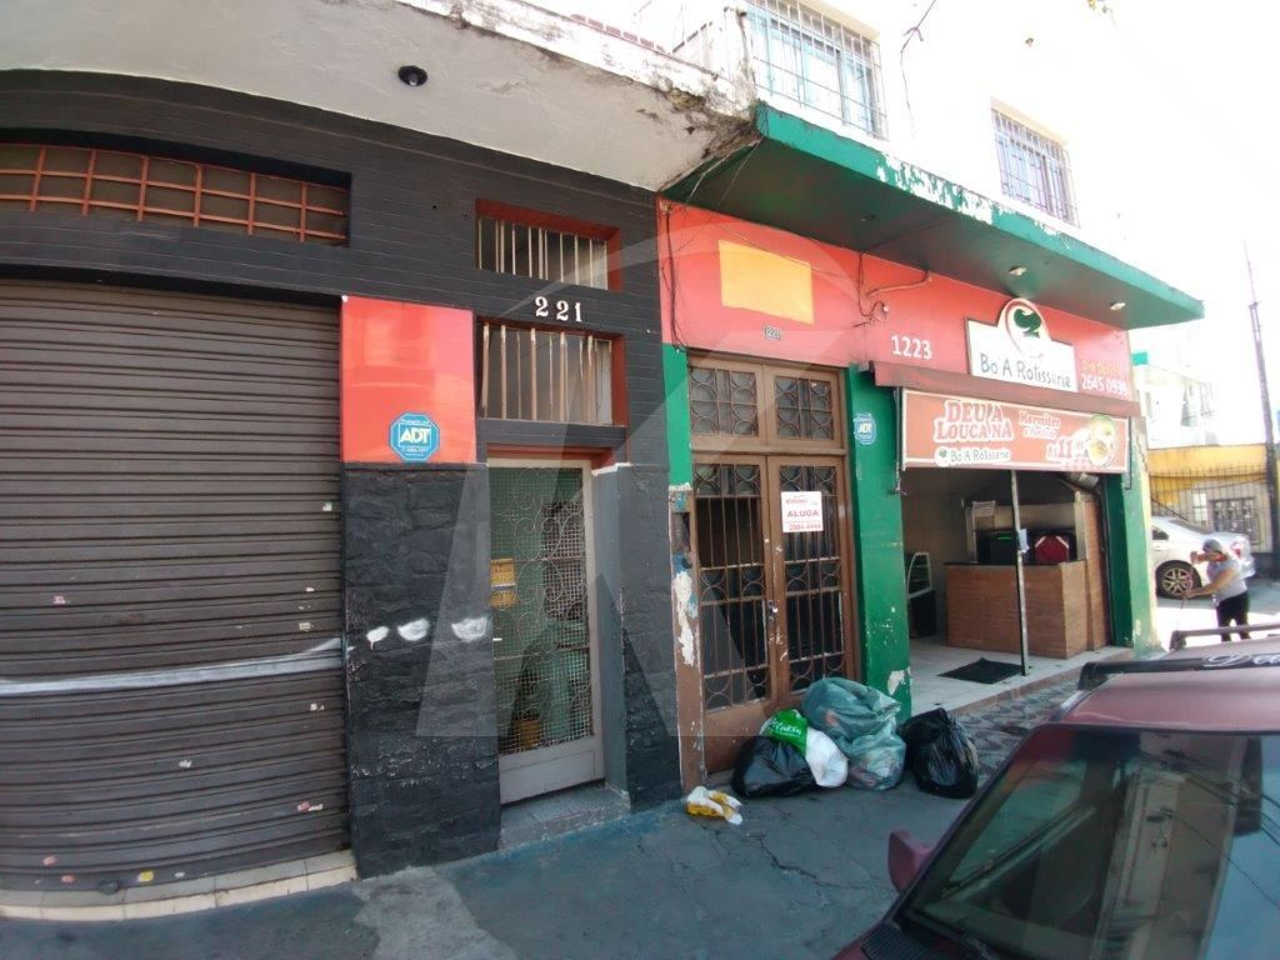 Comprar - Prédio - Jardim Brasil (Zona Norte) - 0 dormitórios.